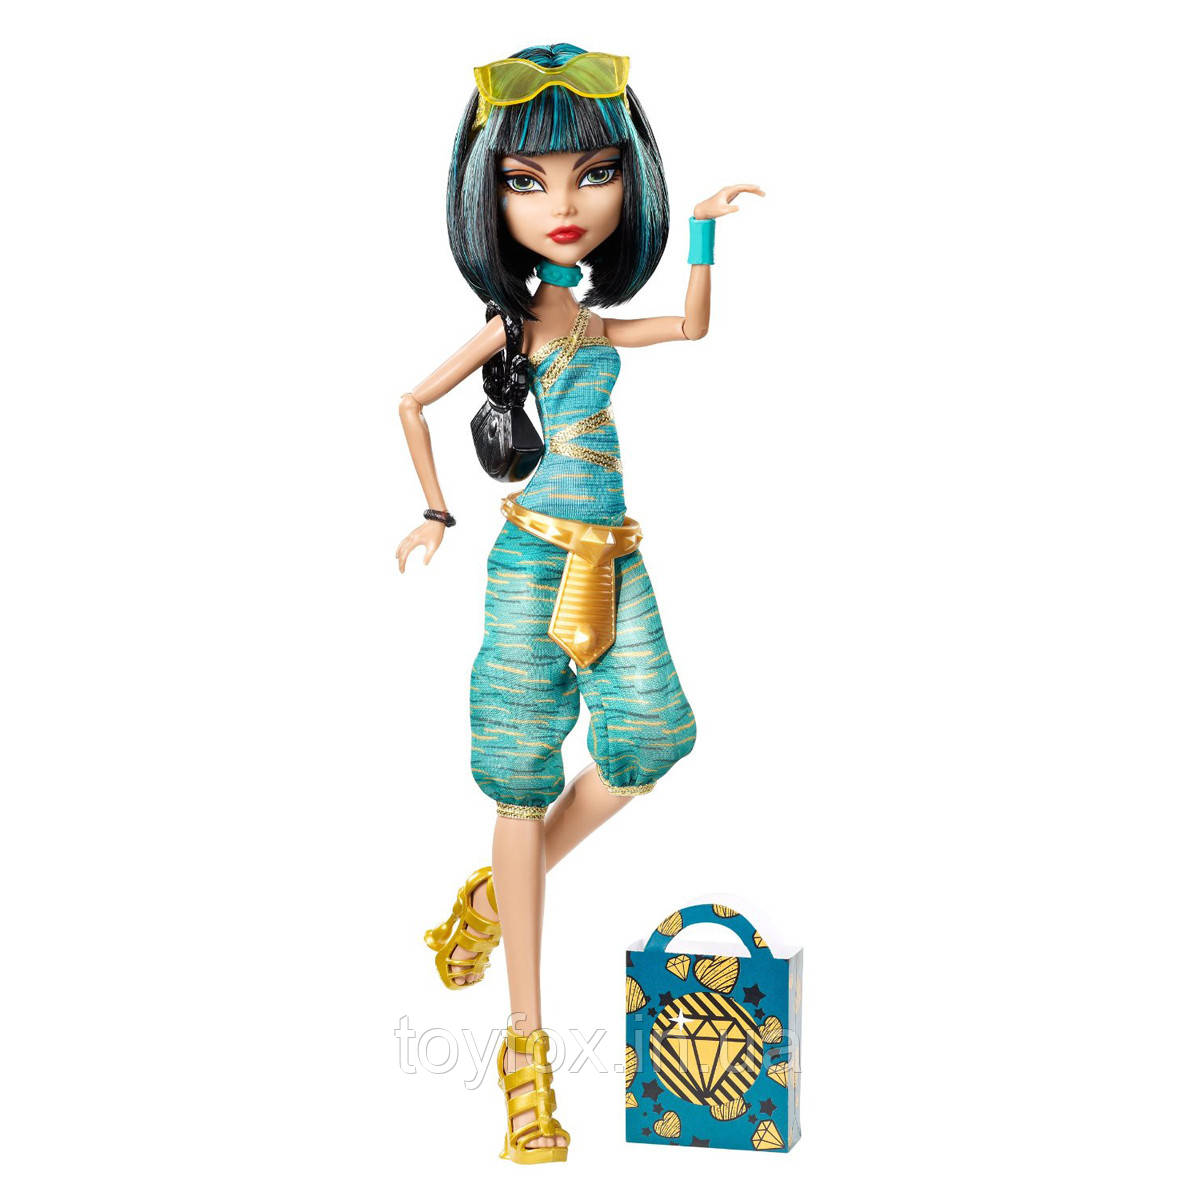 Куклы Монстер Хай Я Люблю Обувь - Monster High I Love Shoes